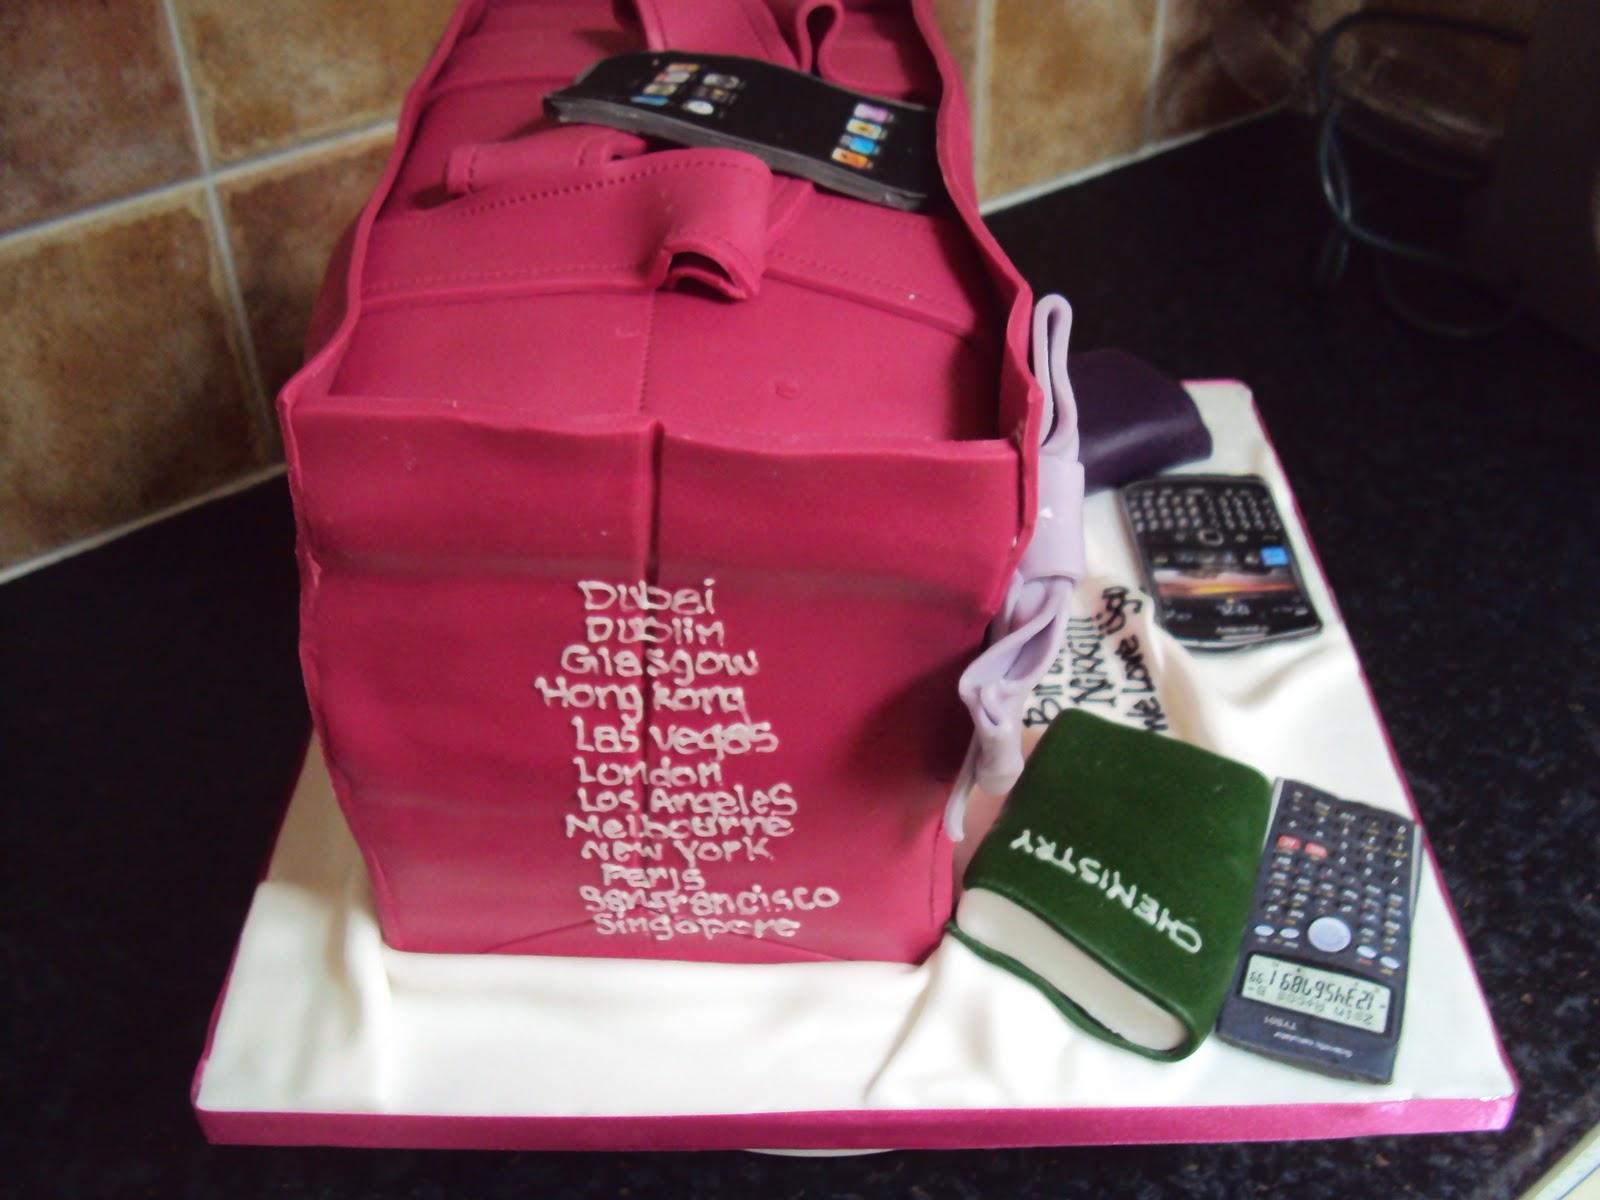 designer-bags-lv-gucci-prada-cakes-cupcakes-22